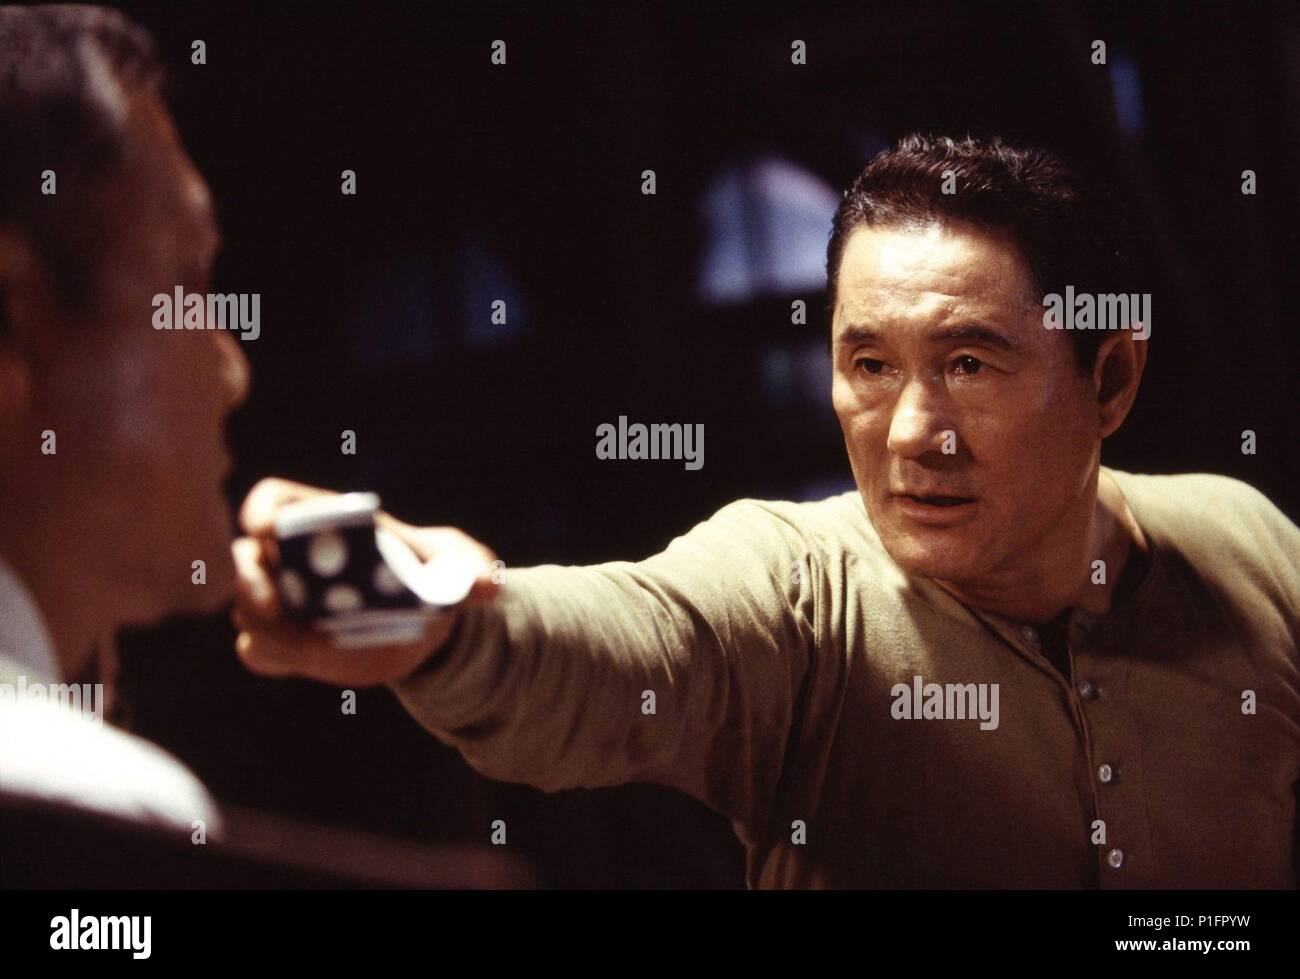 Original Film Title Chi To Hone English Title Blood And Bones Film Director Yoichi Sai Year 2004 Stars Takeshi Kitano Credit Artist Film Asahi